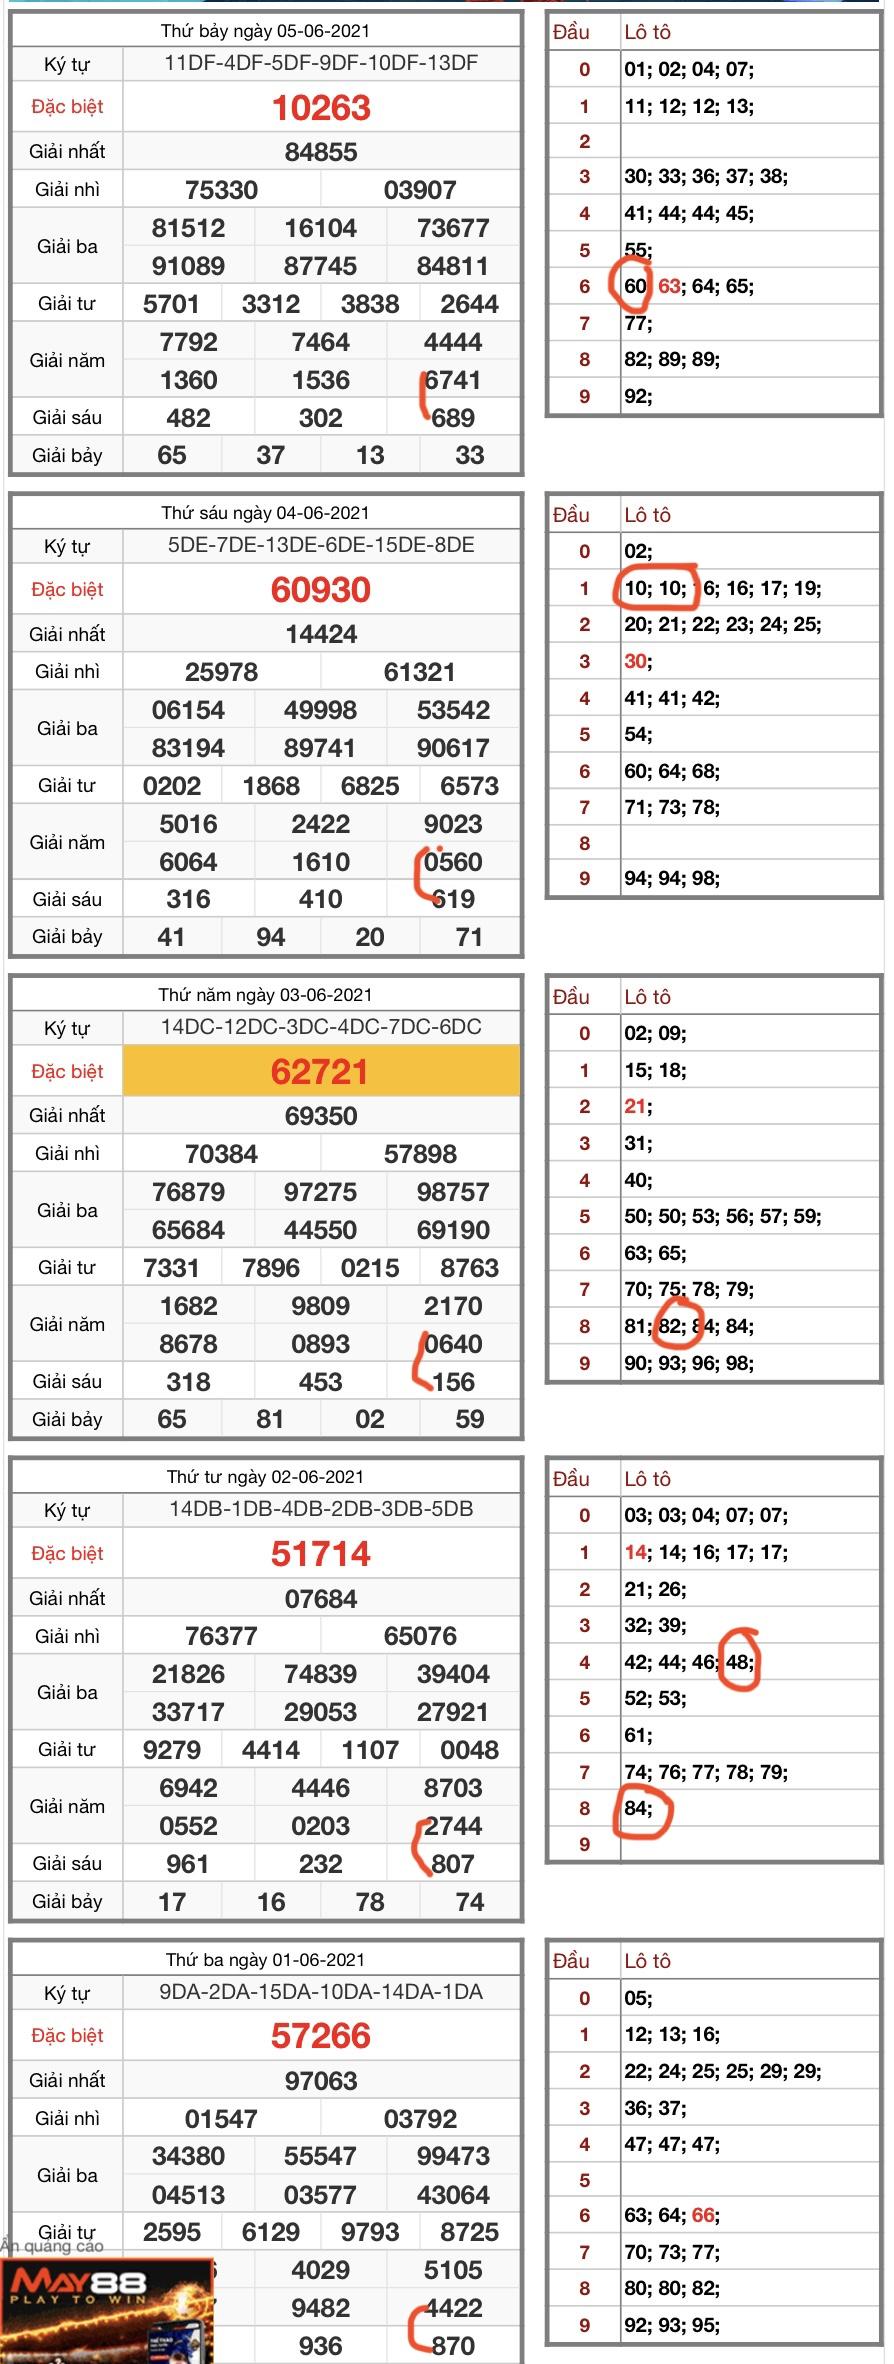 7EC1498D-569B-42F5-BE95-1016CE1BD756.jpeg